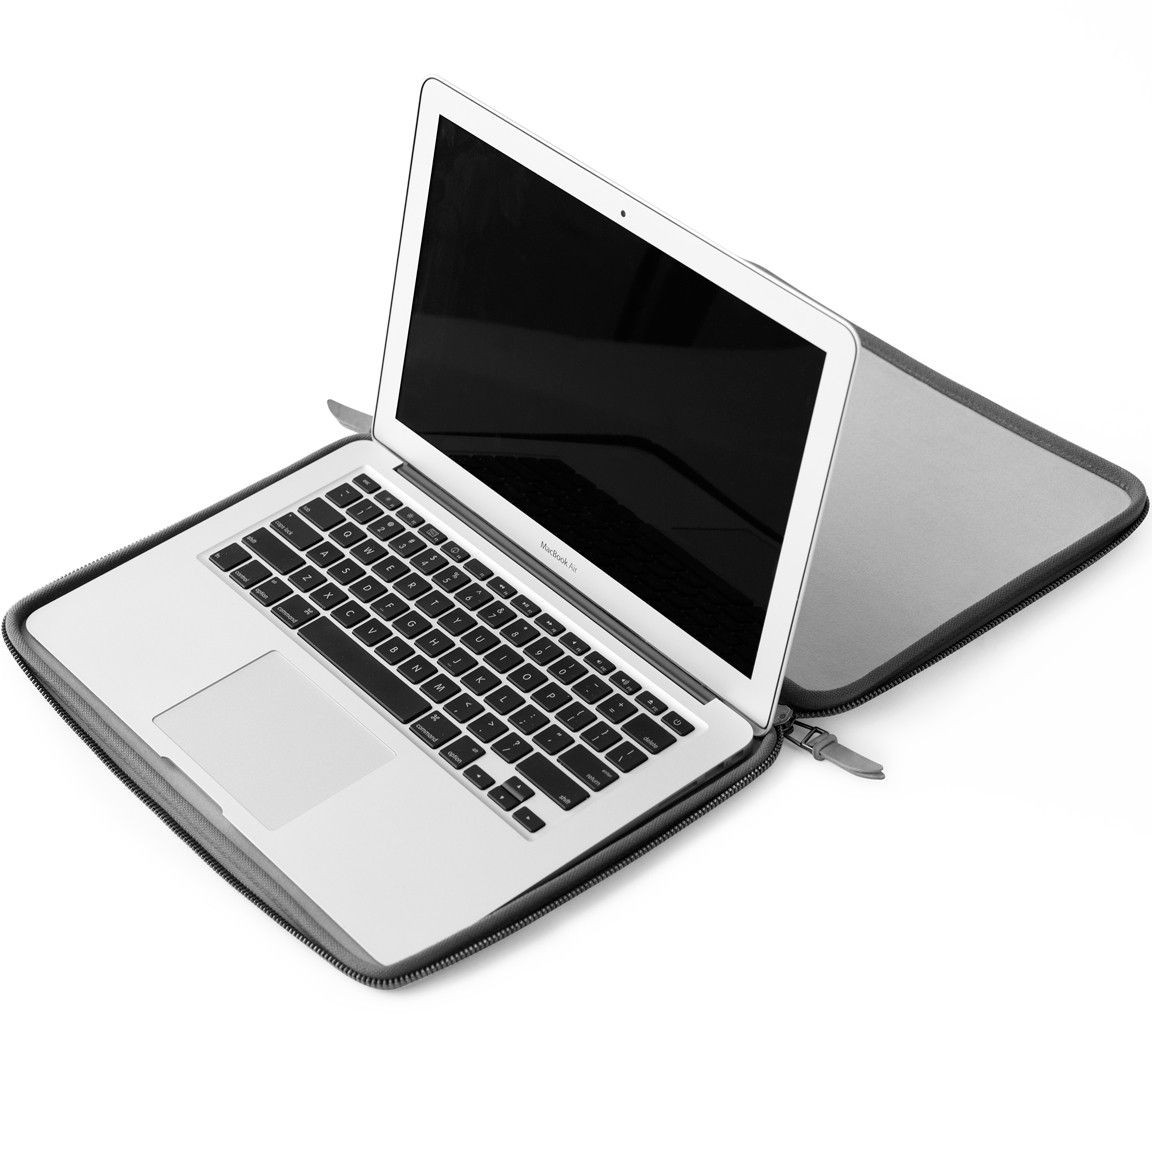 "Laptop Case 13"" | Army Green"